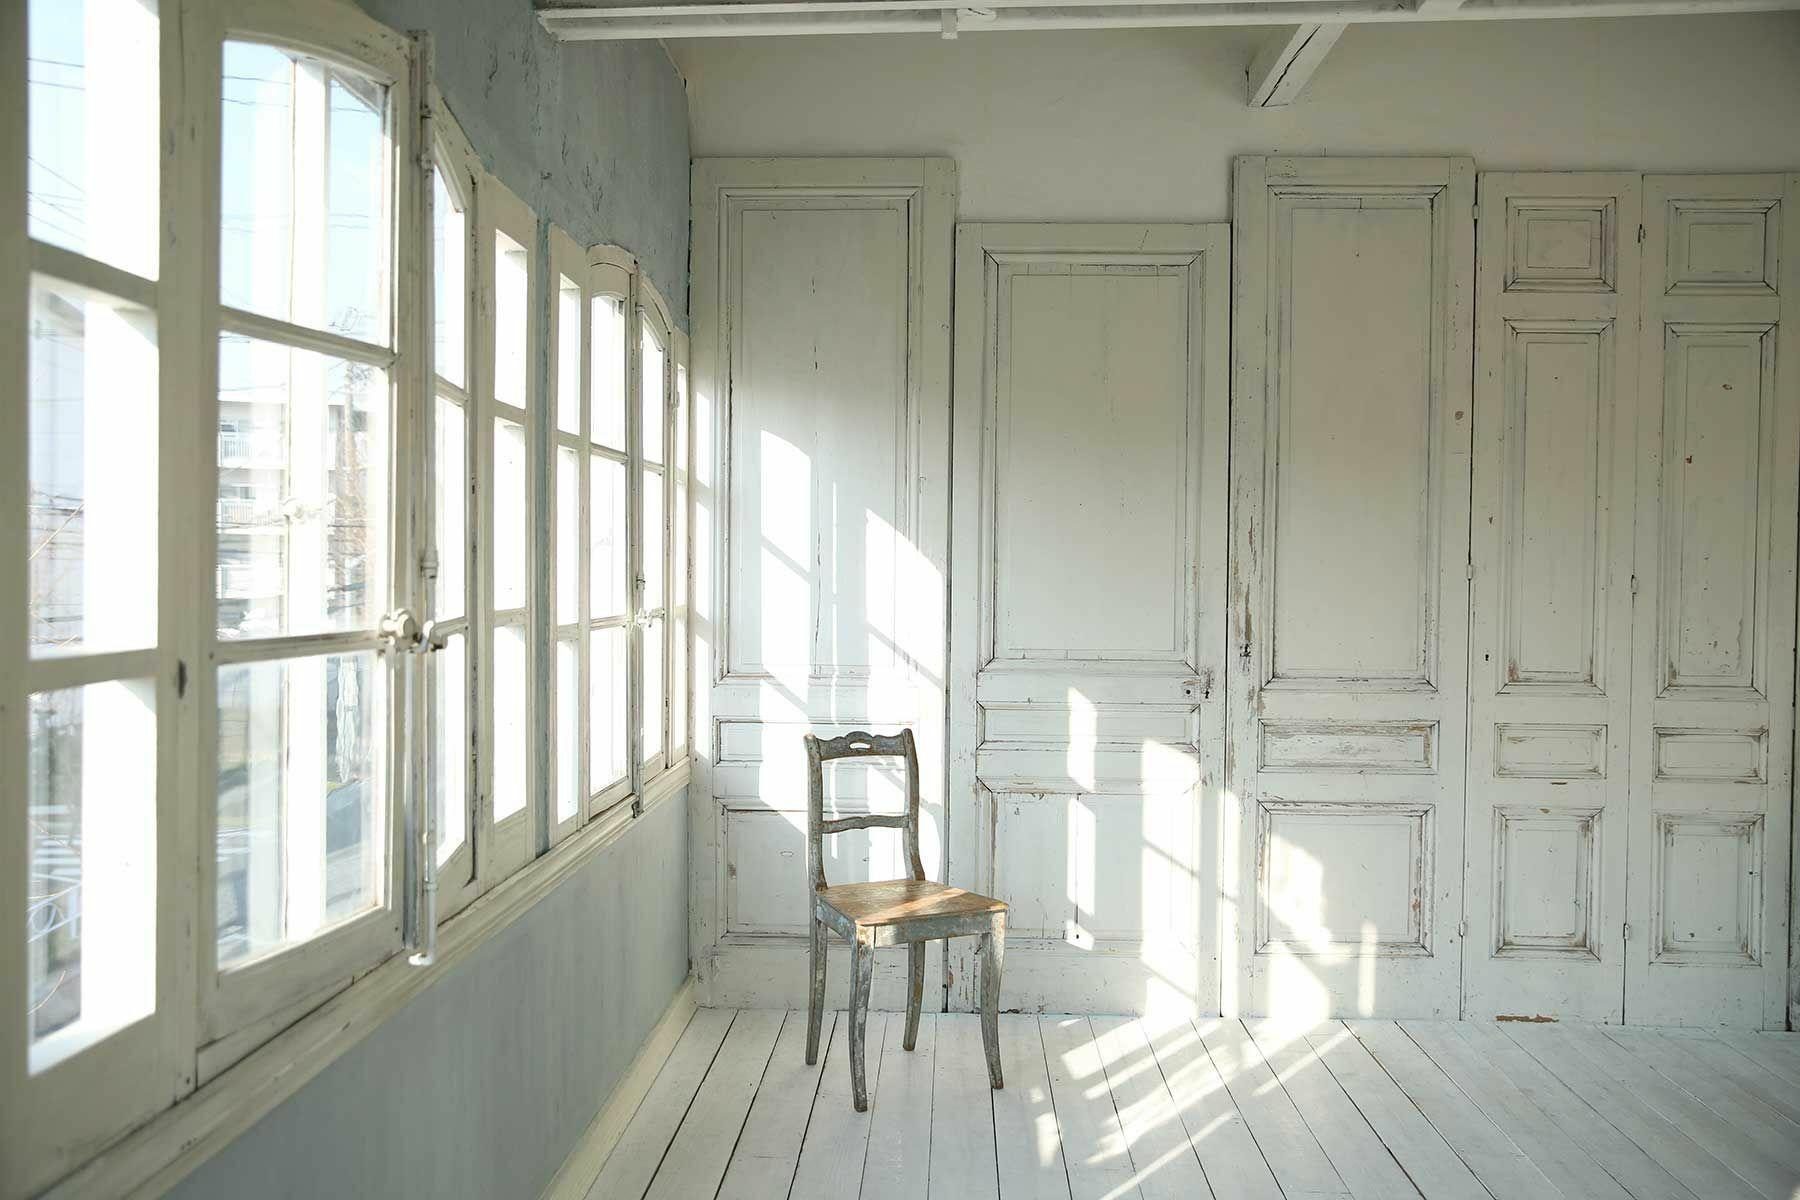 studio itto 目黒碑文谷2Fst (スタジオ イット)西側 ブルー部屋